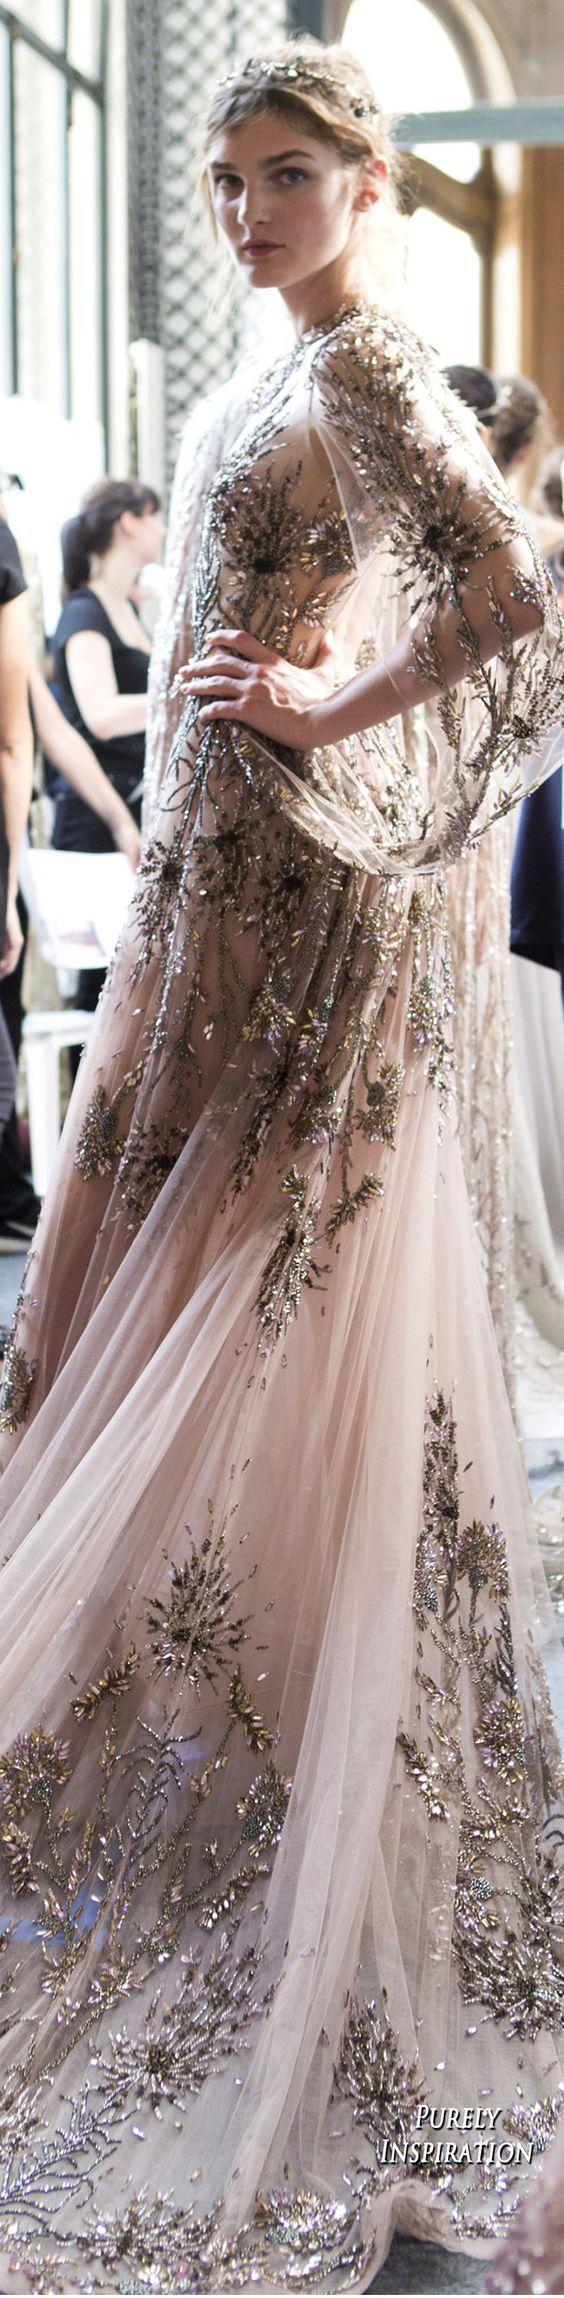 Zuhair Murad Fall 2017 Haute Couture | Purely Inspiration